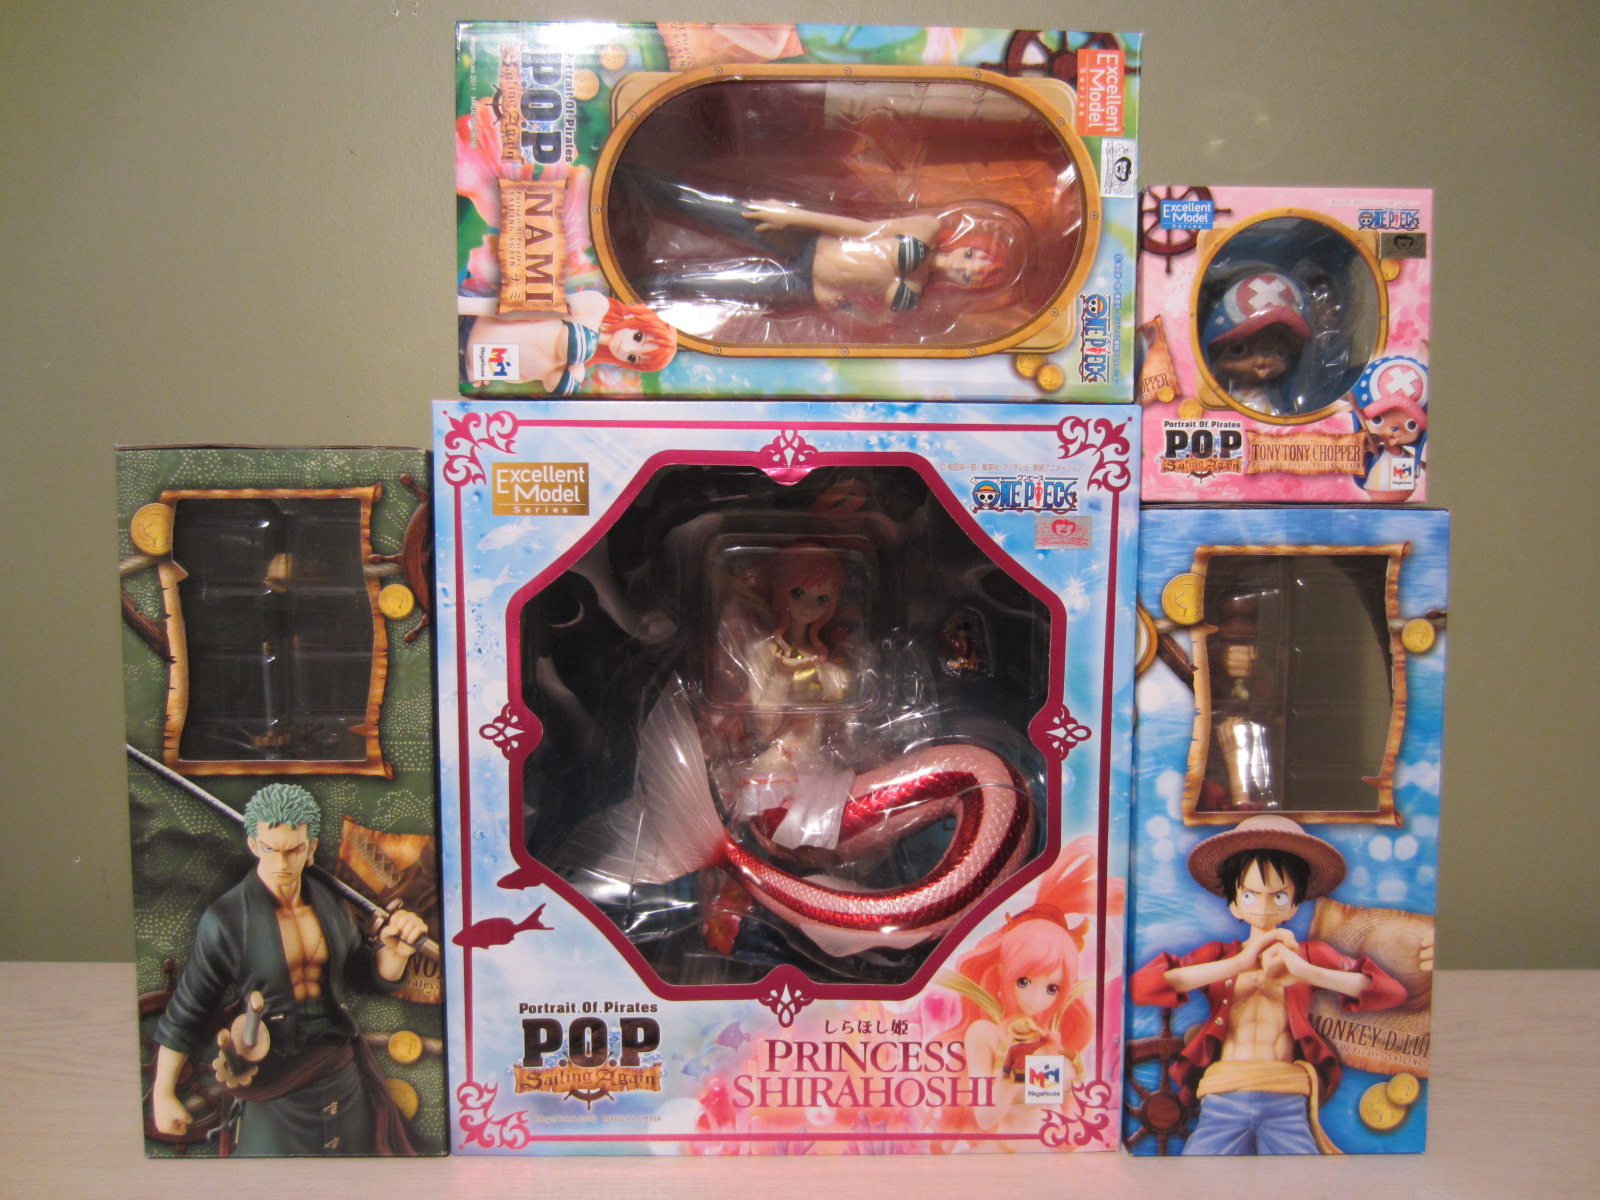 "megahouse one_piece nami monkey_d._luffy excellent_model roronoa_zoro tony_tony_chopper shueisha ajiken oda_eiichiro attm toei_animation portrait_of_pirates_""sailing_again"" shirahoshi ishiyama_yuuki"